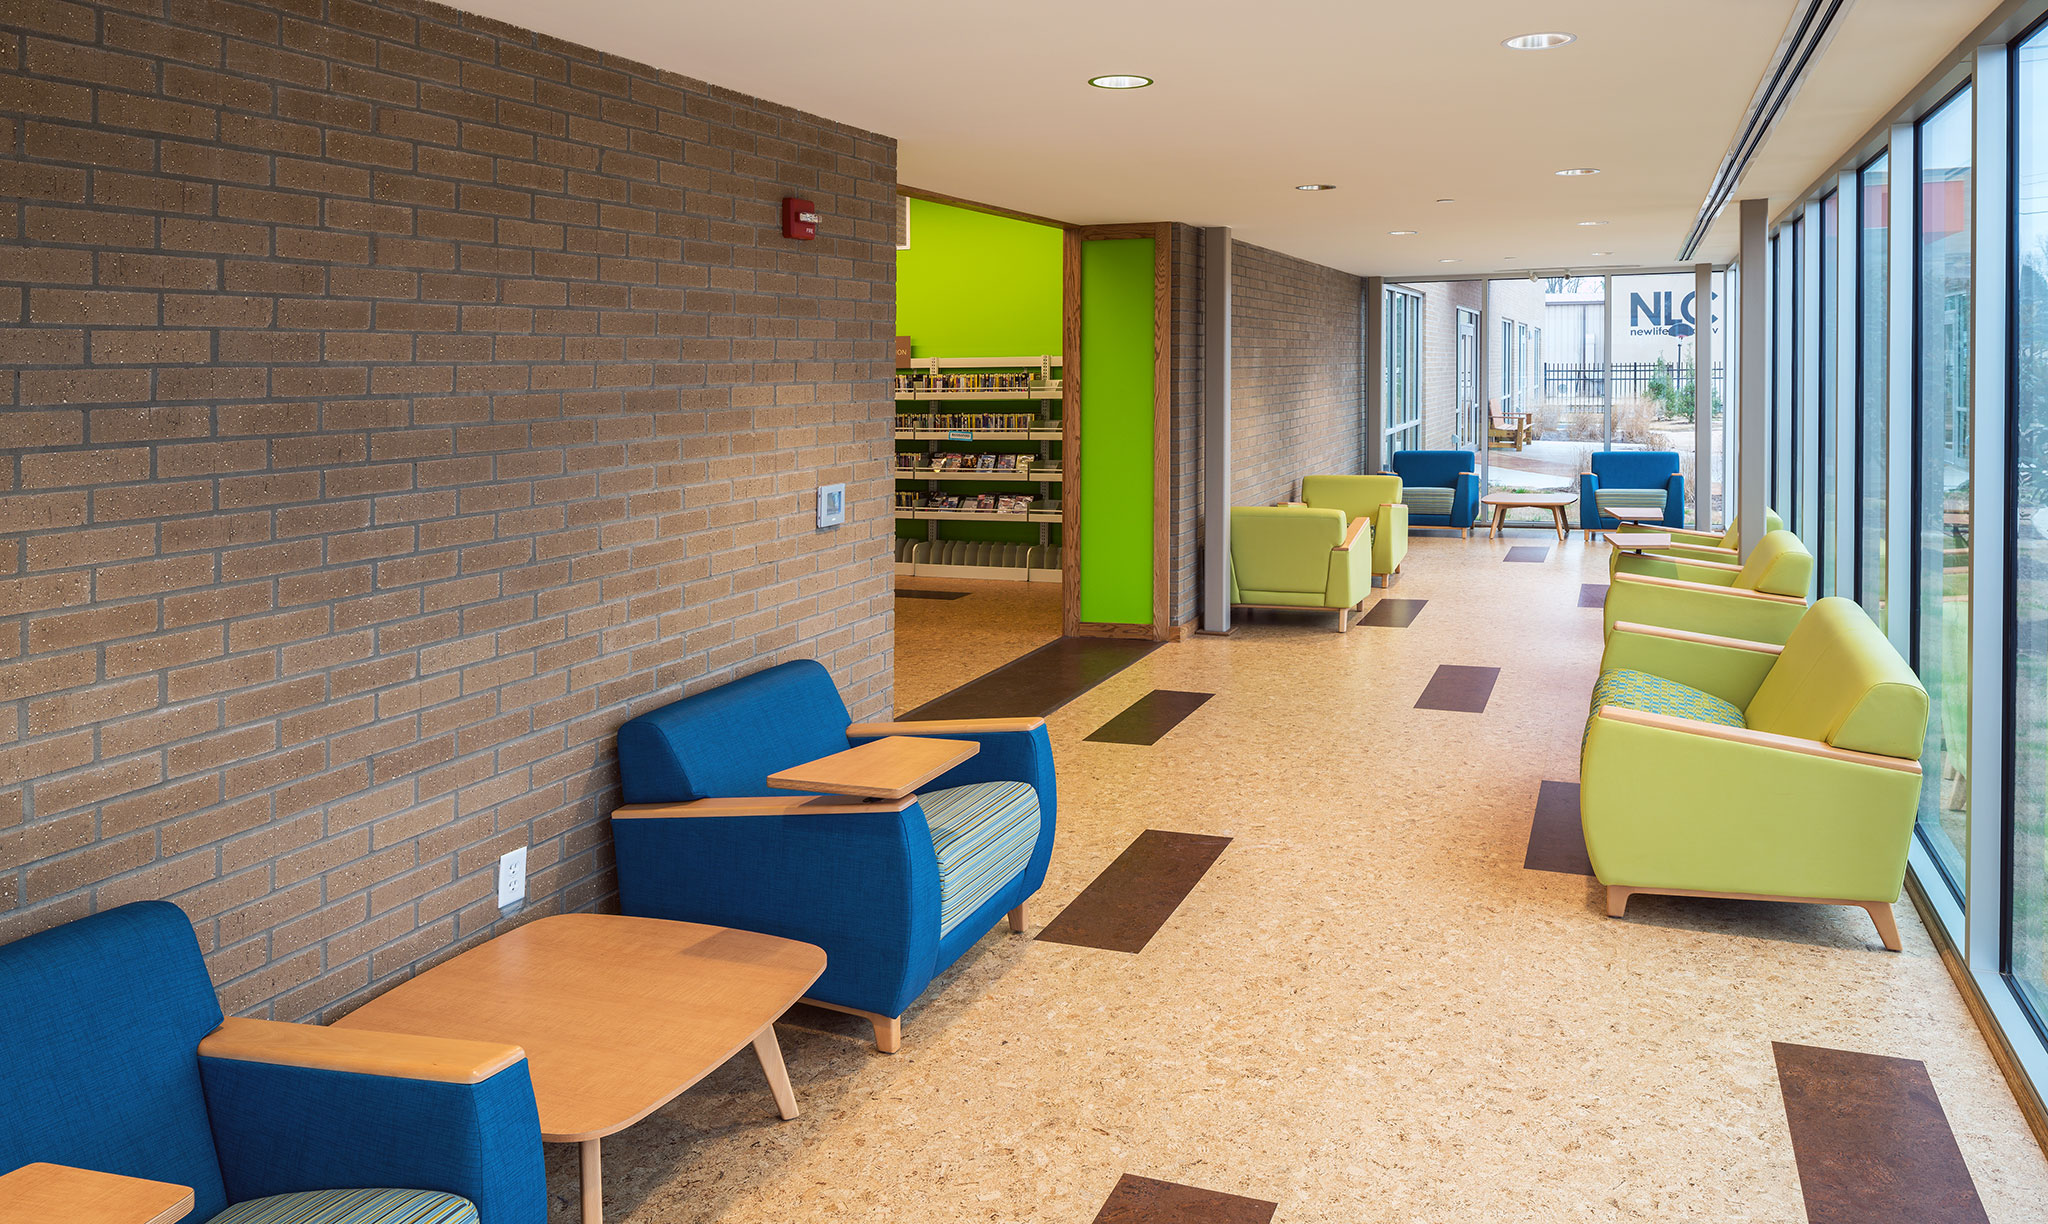 Cabot_library04_Sela_library_corbett_norristown_experience-center.jpg